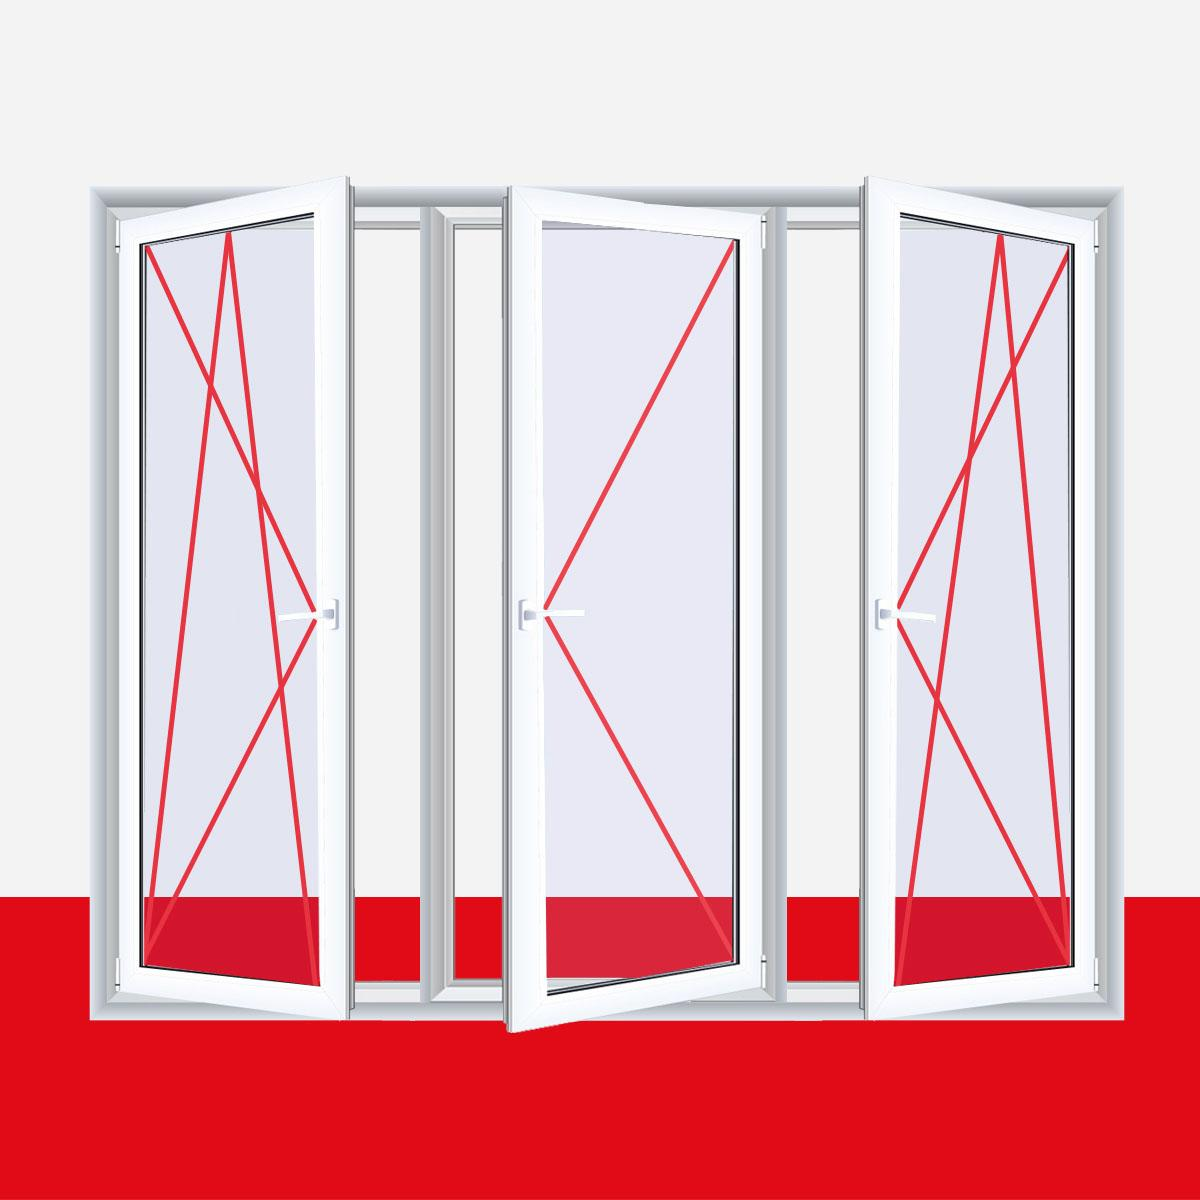 fenster silvit wei 3 flg dreh kipp dreh dreh kipp kunststofffenster. Black Bedroom Furniture Sets. Home Design Ideas